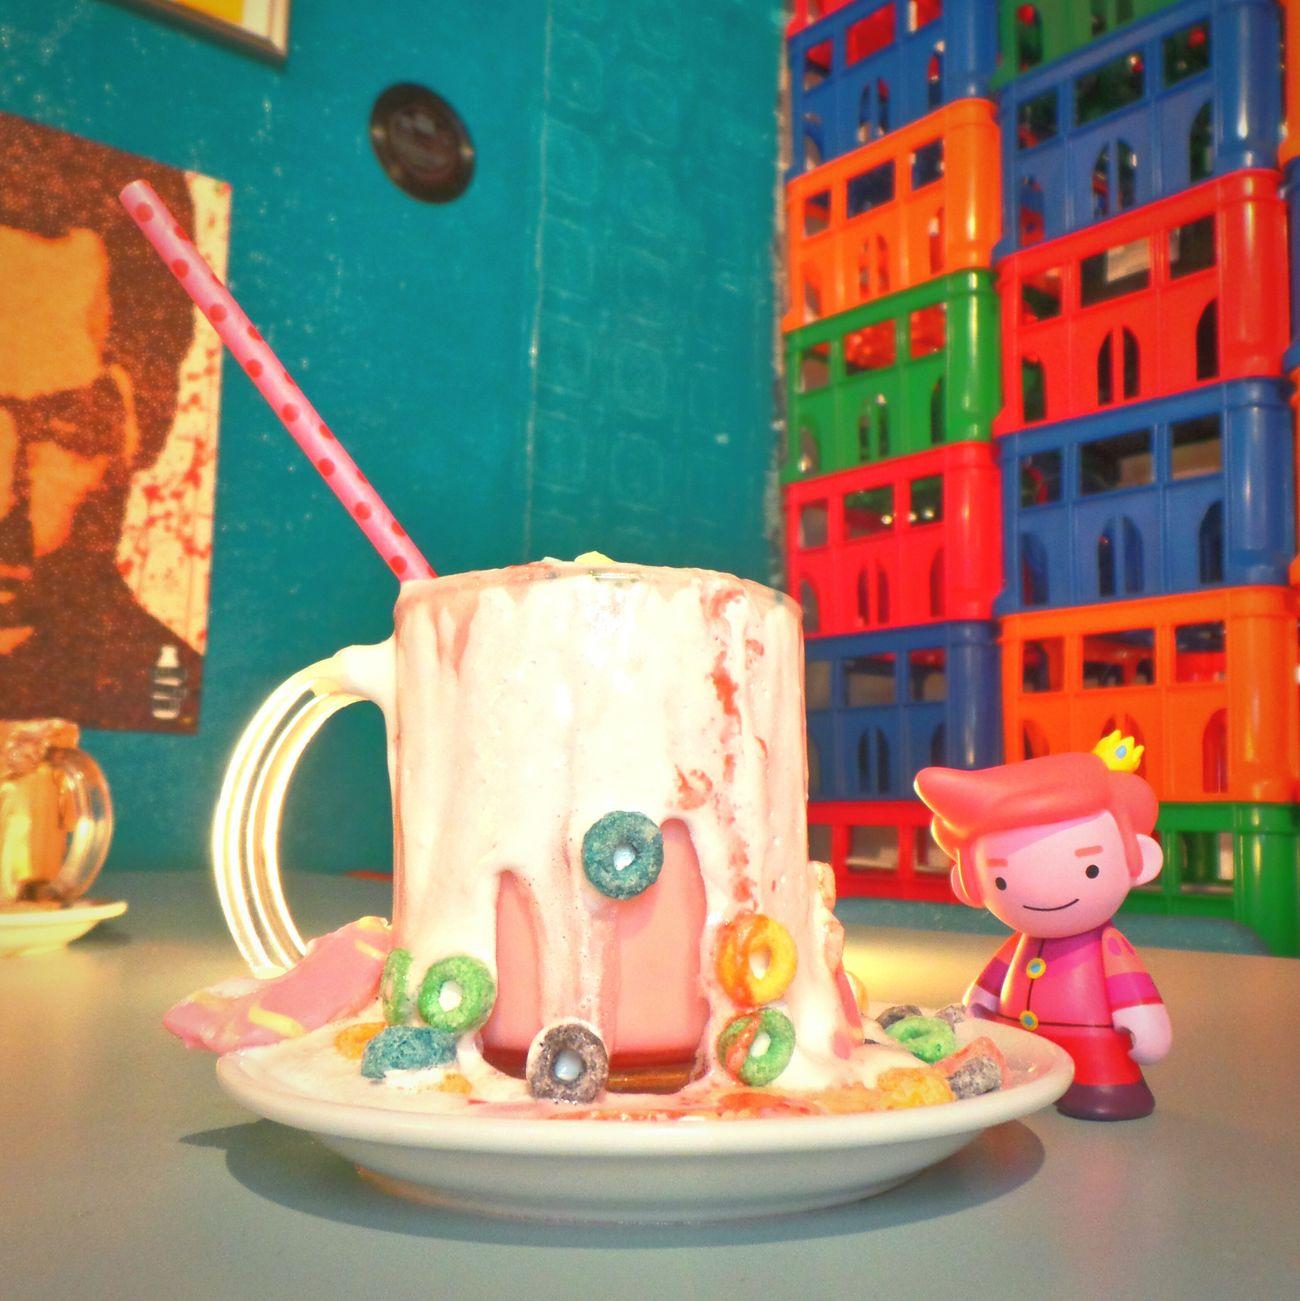 Teatime with PrinceBubblegum at Cerealkillercafe London Adventuretime Kidrobot x Artoyz 😍